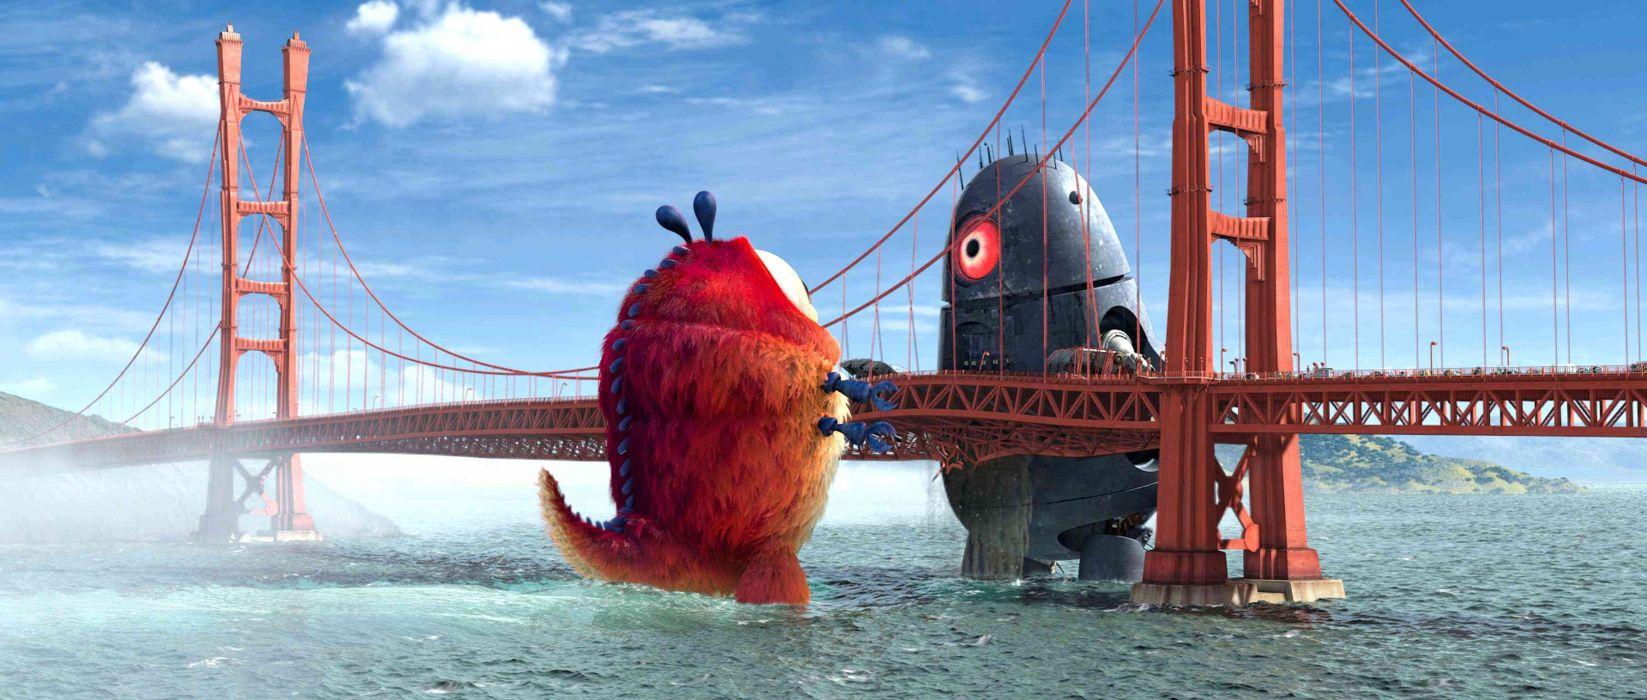 MONSTERS-VS-ALIENS cartoon animation sci-fi monsters aliens monster alien film movie (15) wallpaper